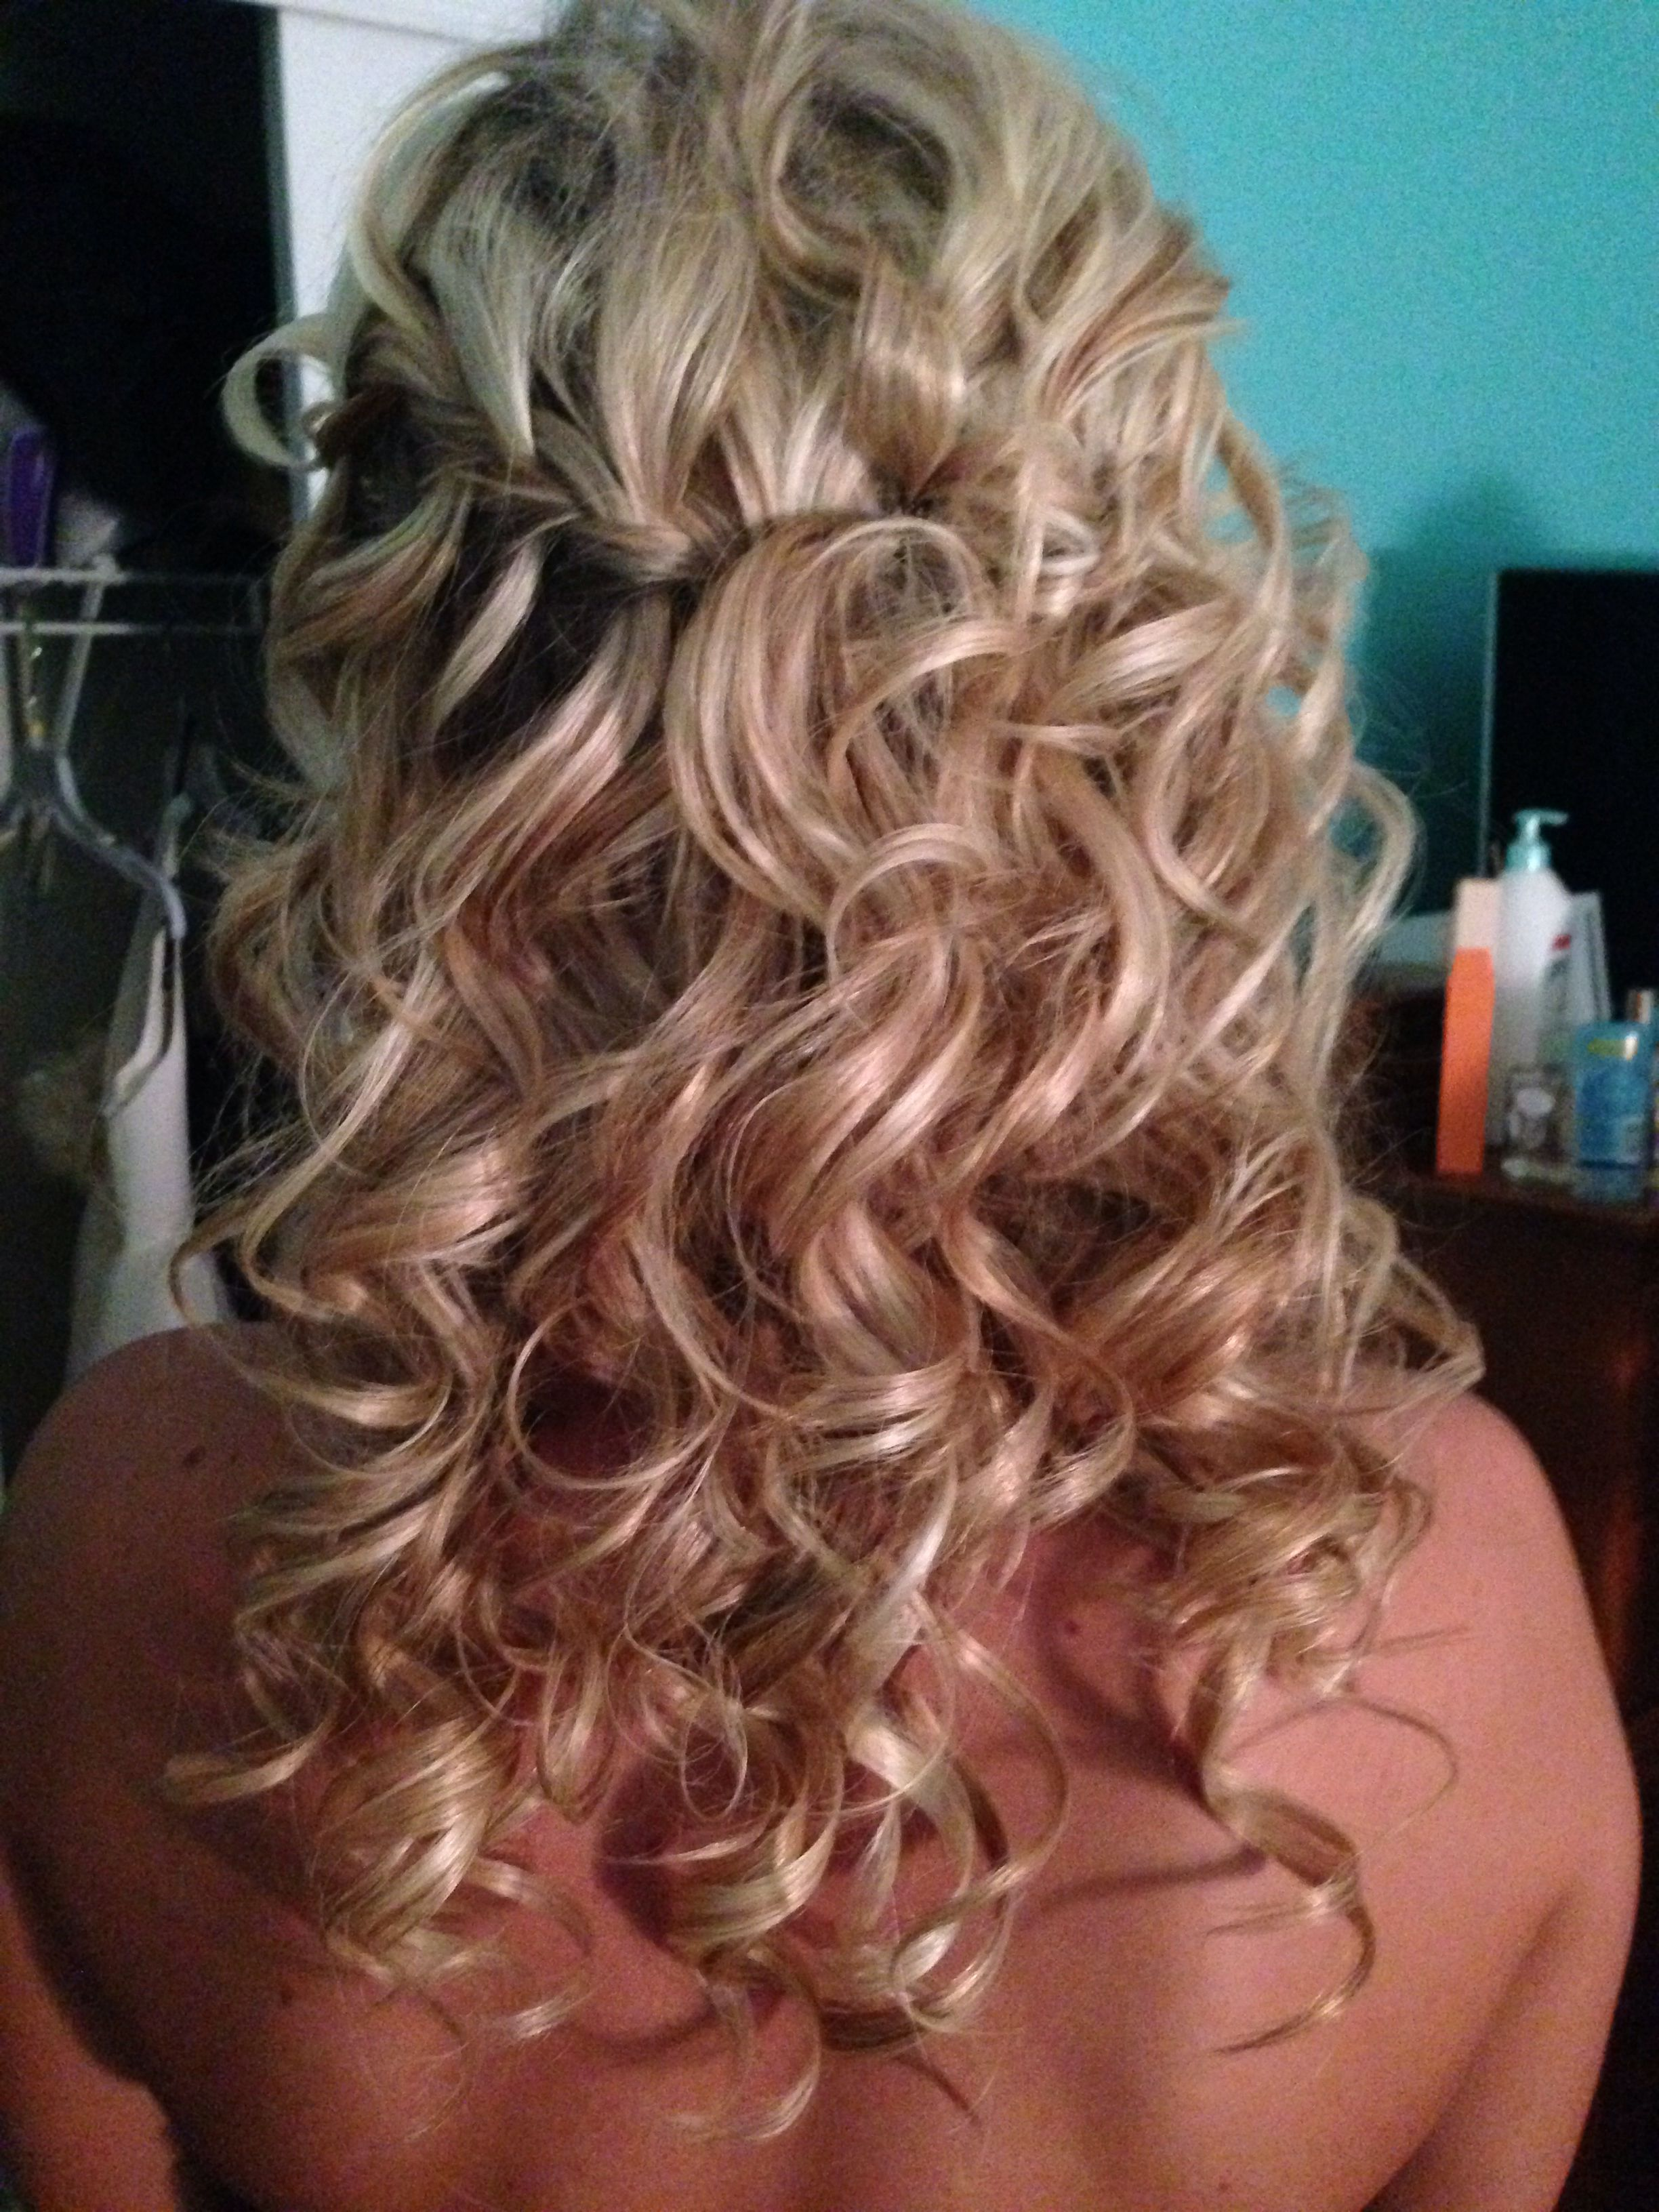 Bridesmaid hairstyle - down and curly | Bridesmaid Hair ...